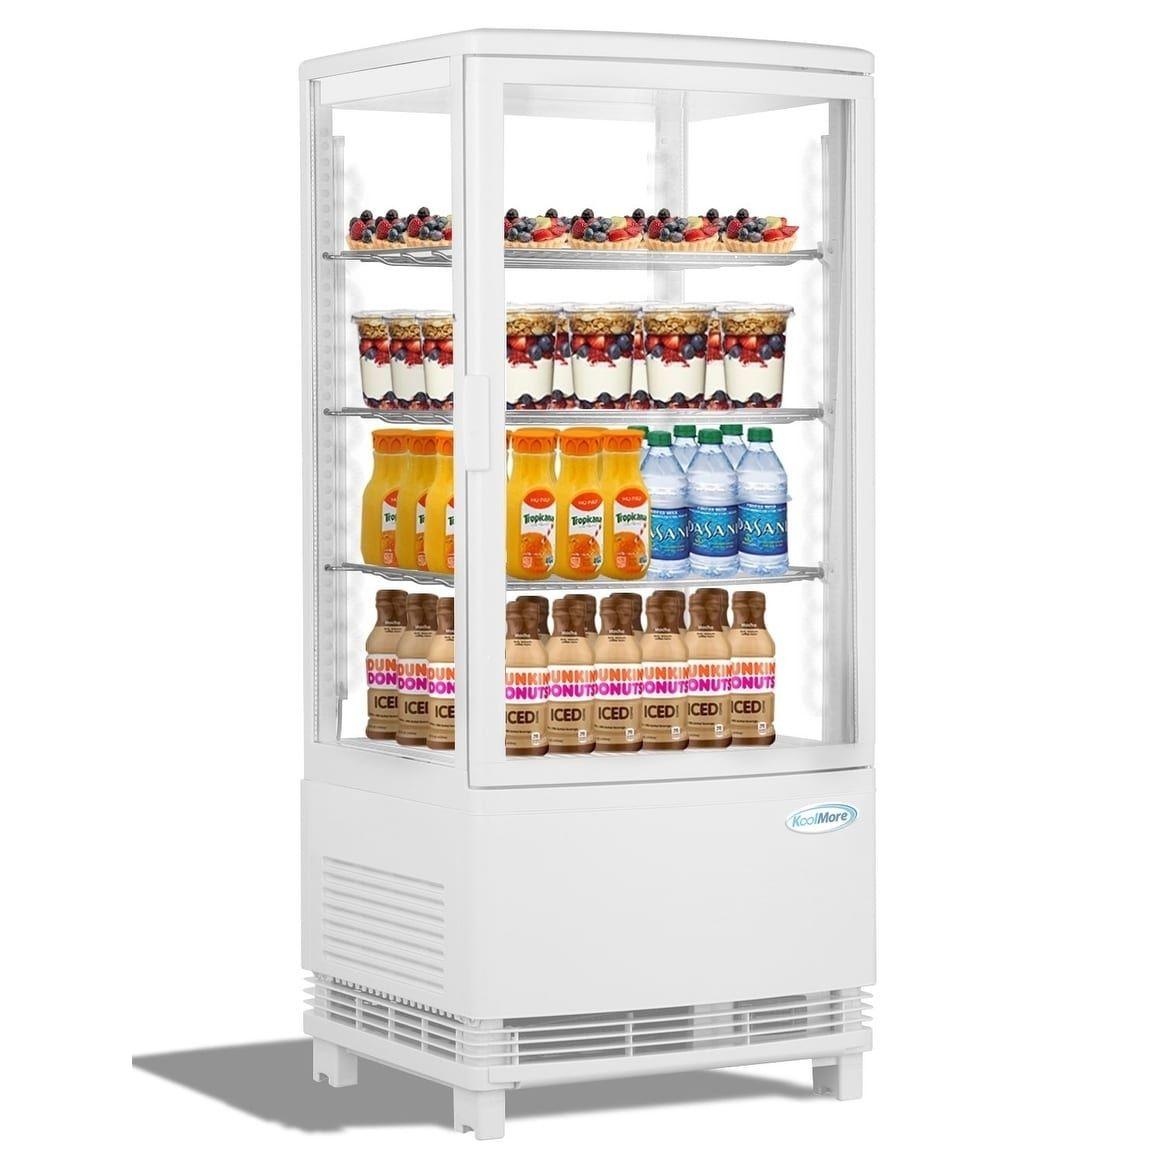 Koolmore Countertop Commercial Refrigerator Display Case 3 Cu